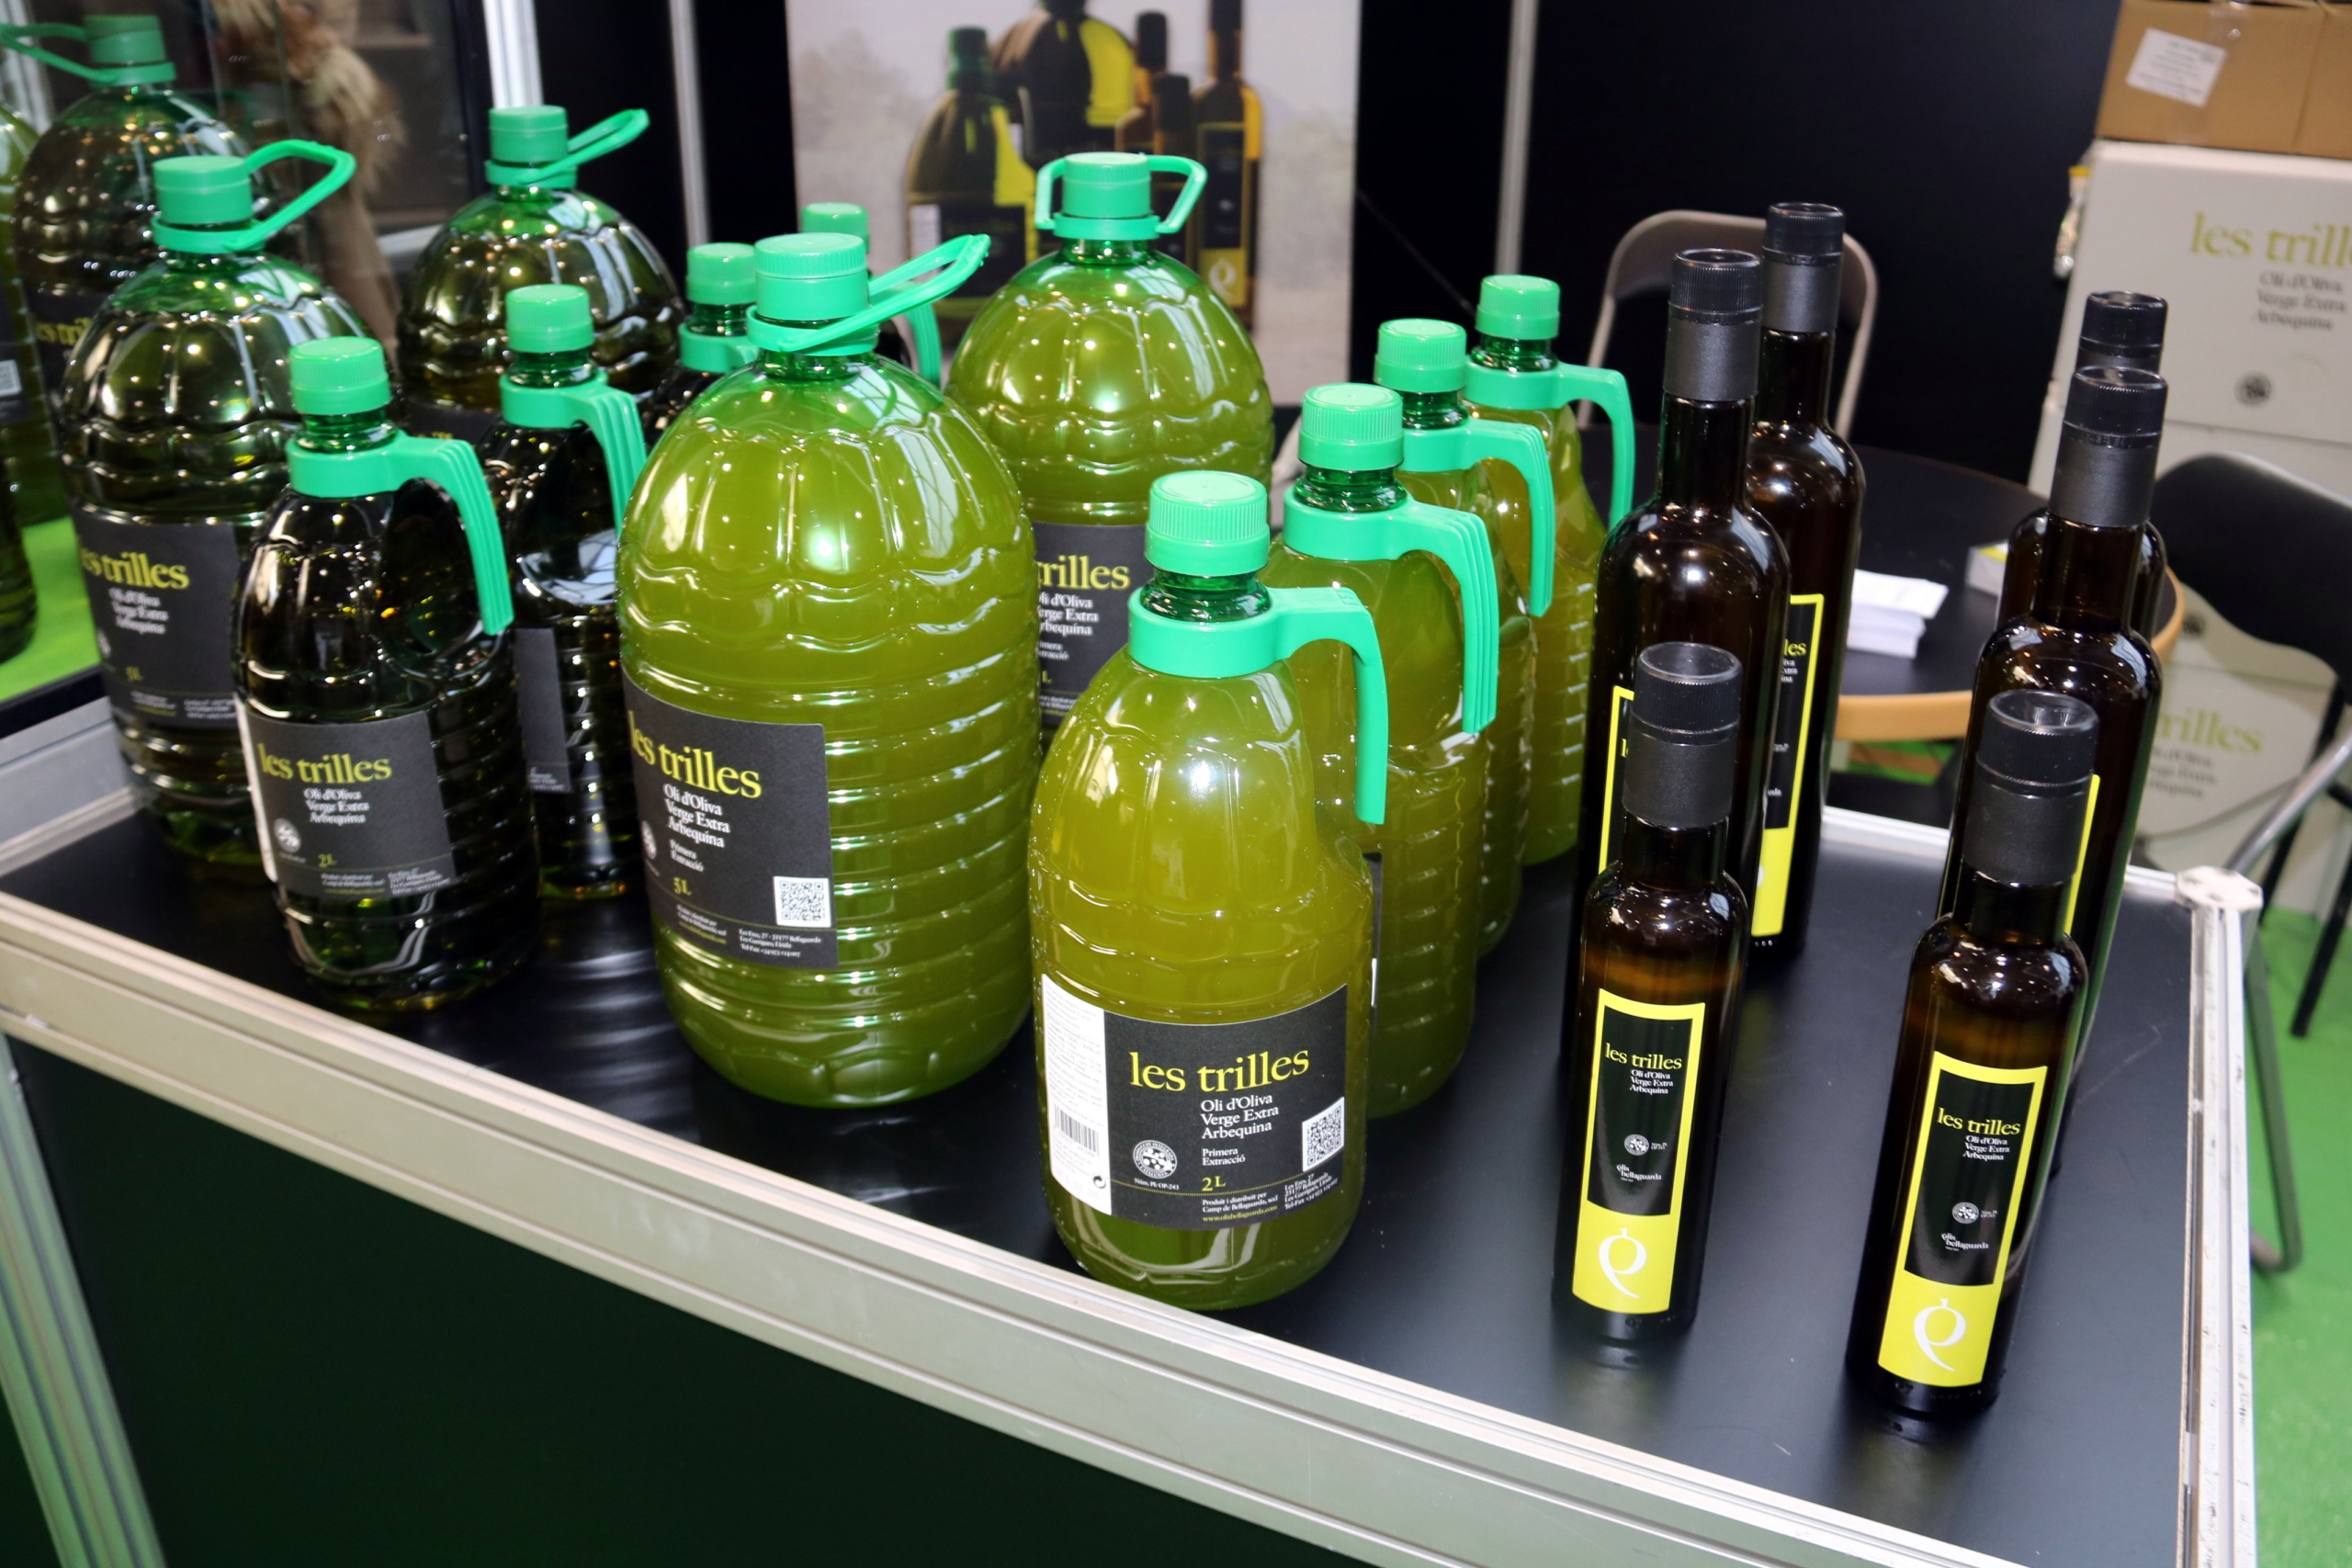 Ampolles d'oli d'oliva de la cooperativa de Bellaguarda | ACN